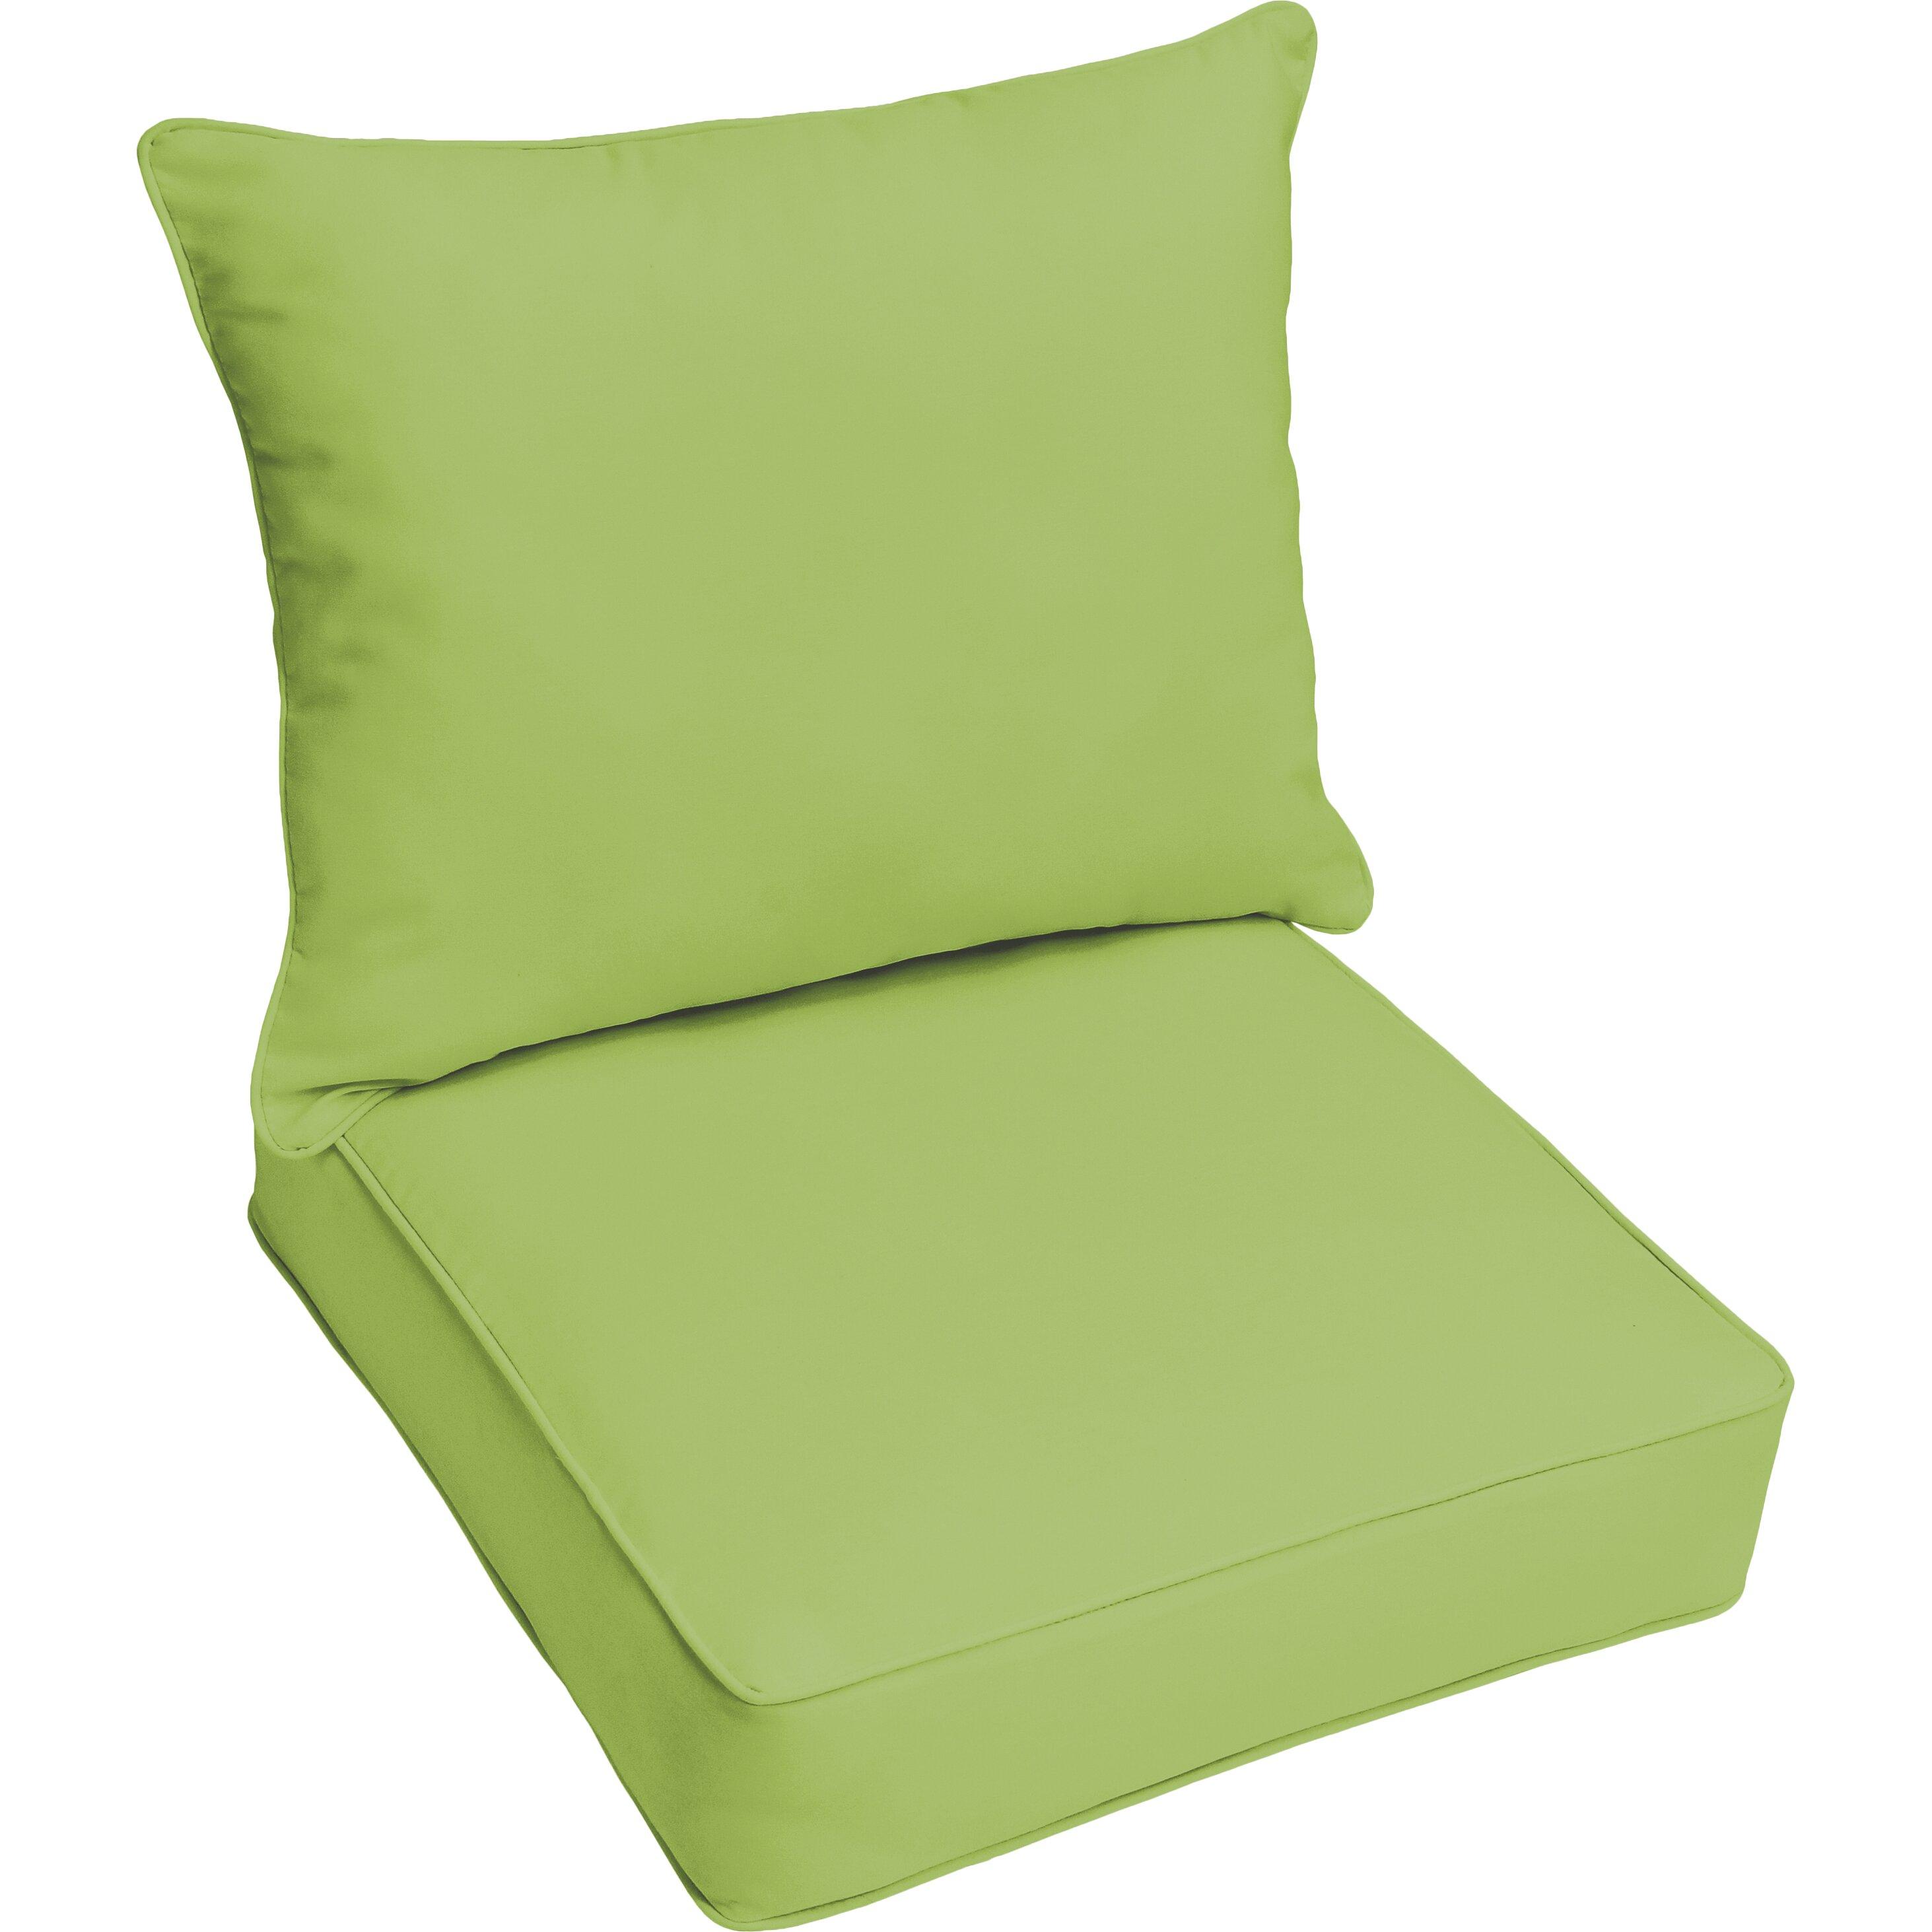 Brayden Studio Kaplan Outdoor Lounge Cushion & Reviews